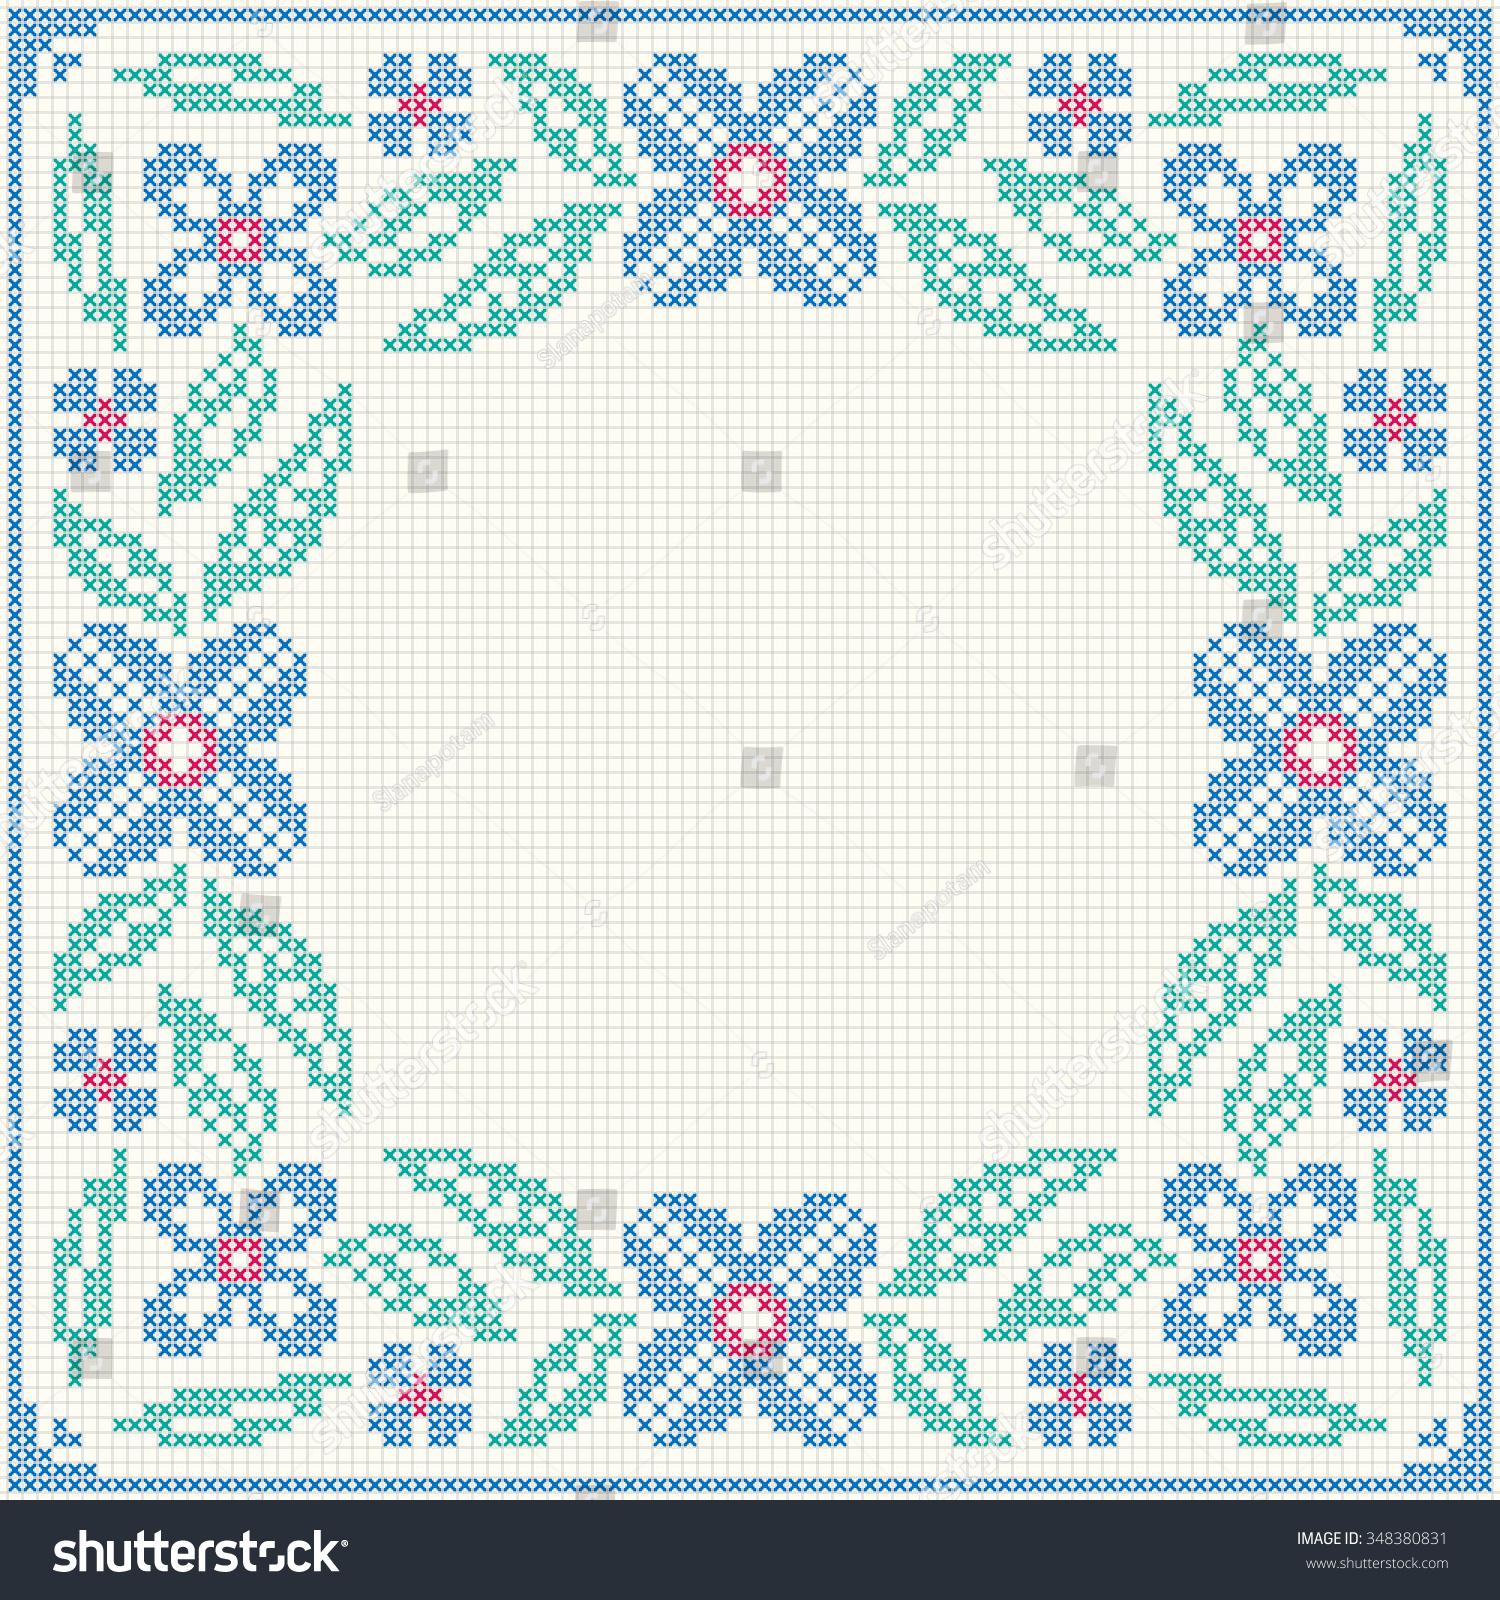 Cross Stitch Flower Pattern Floral Frame Stock-Vektorgrafik ...